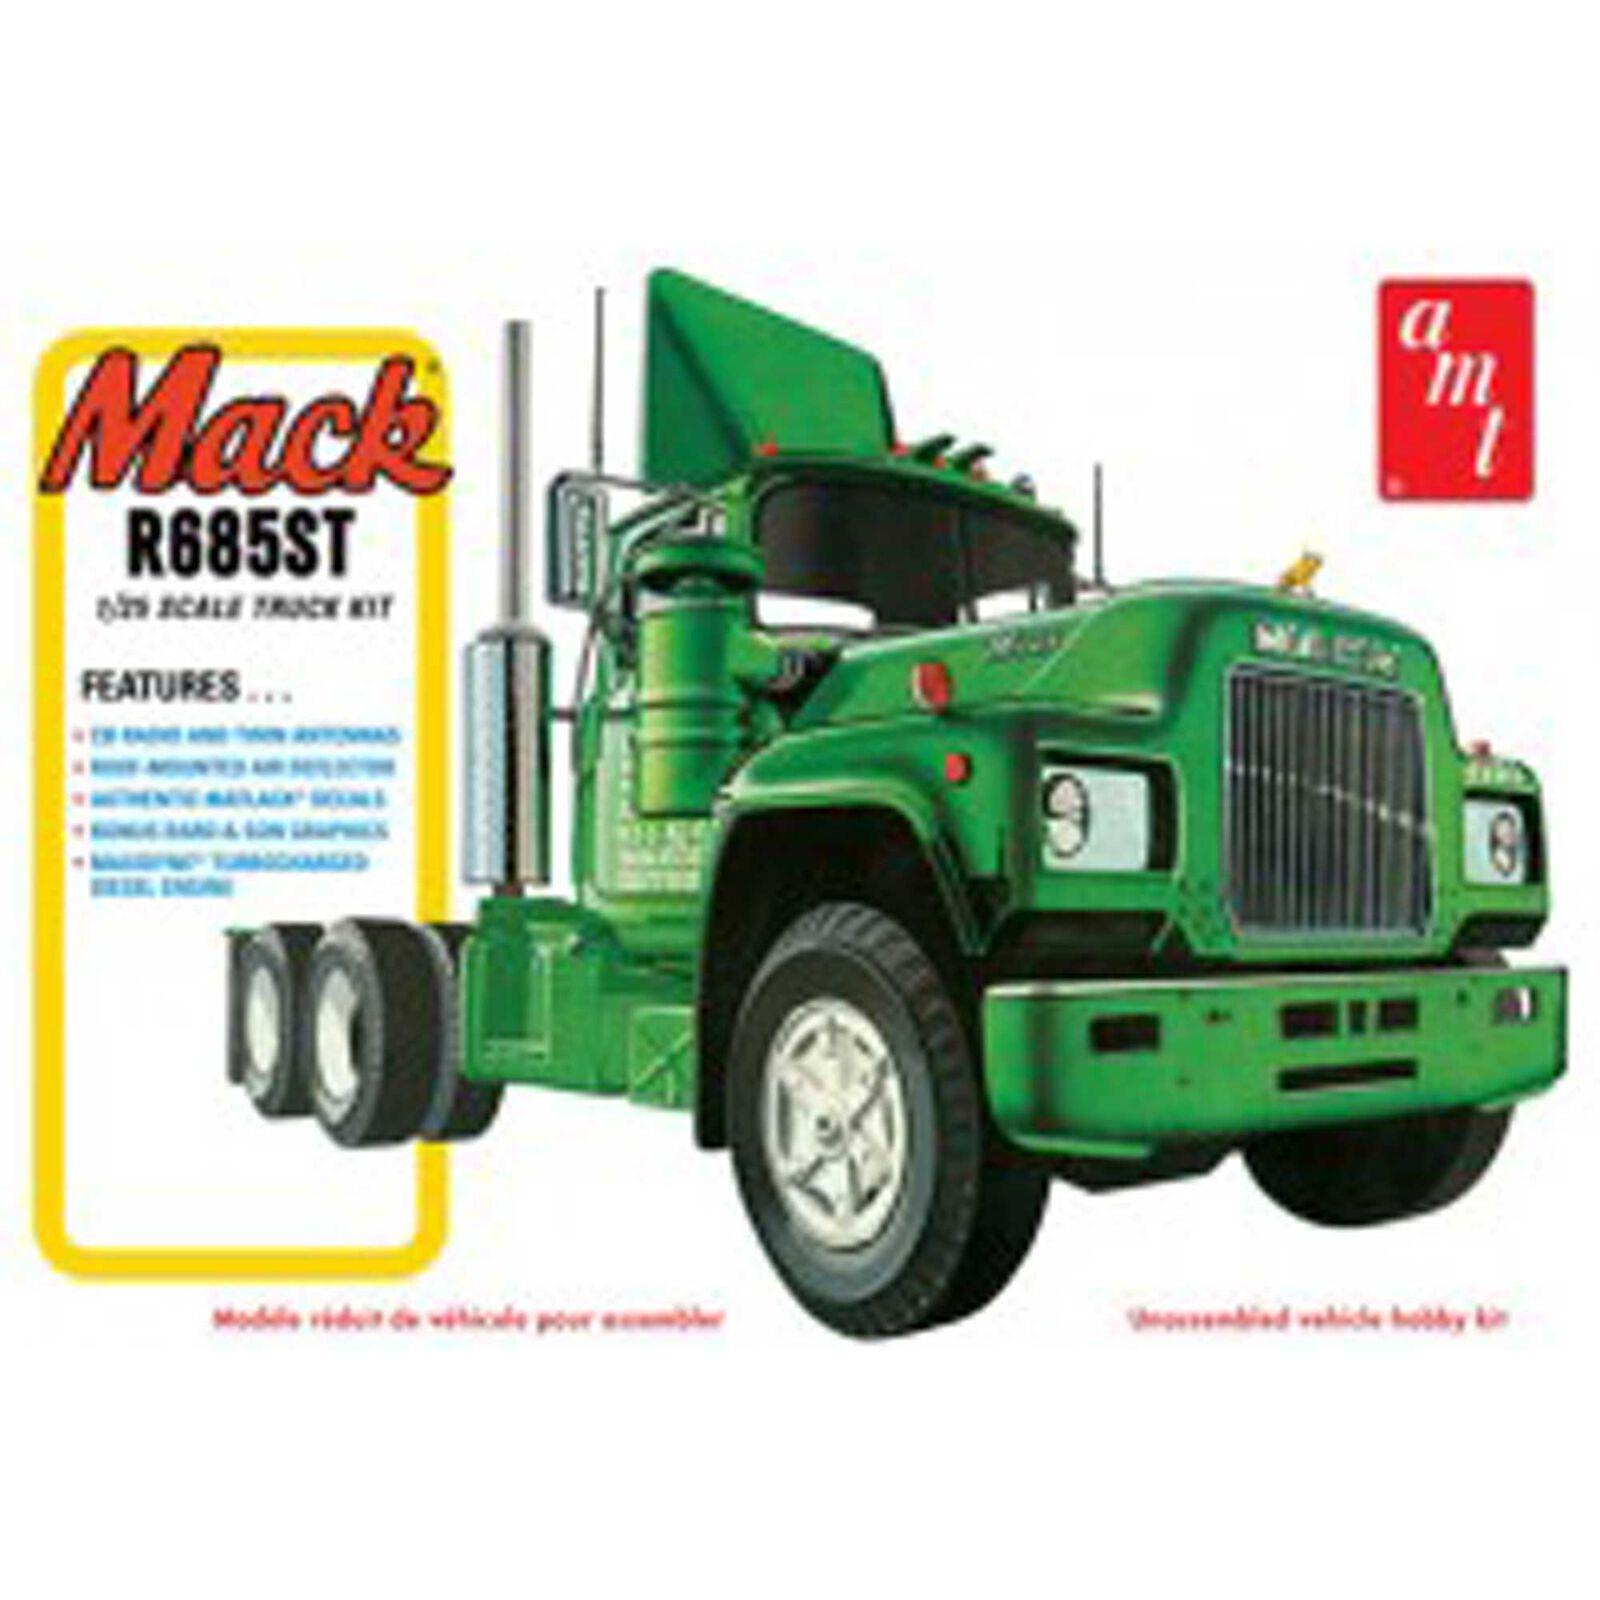 1/25, Mack R685ST Semi Tractor, Model Kit